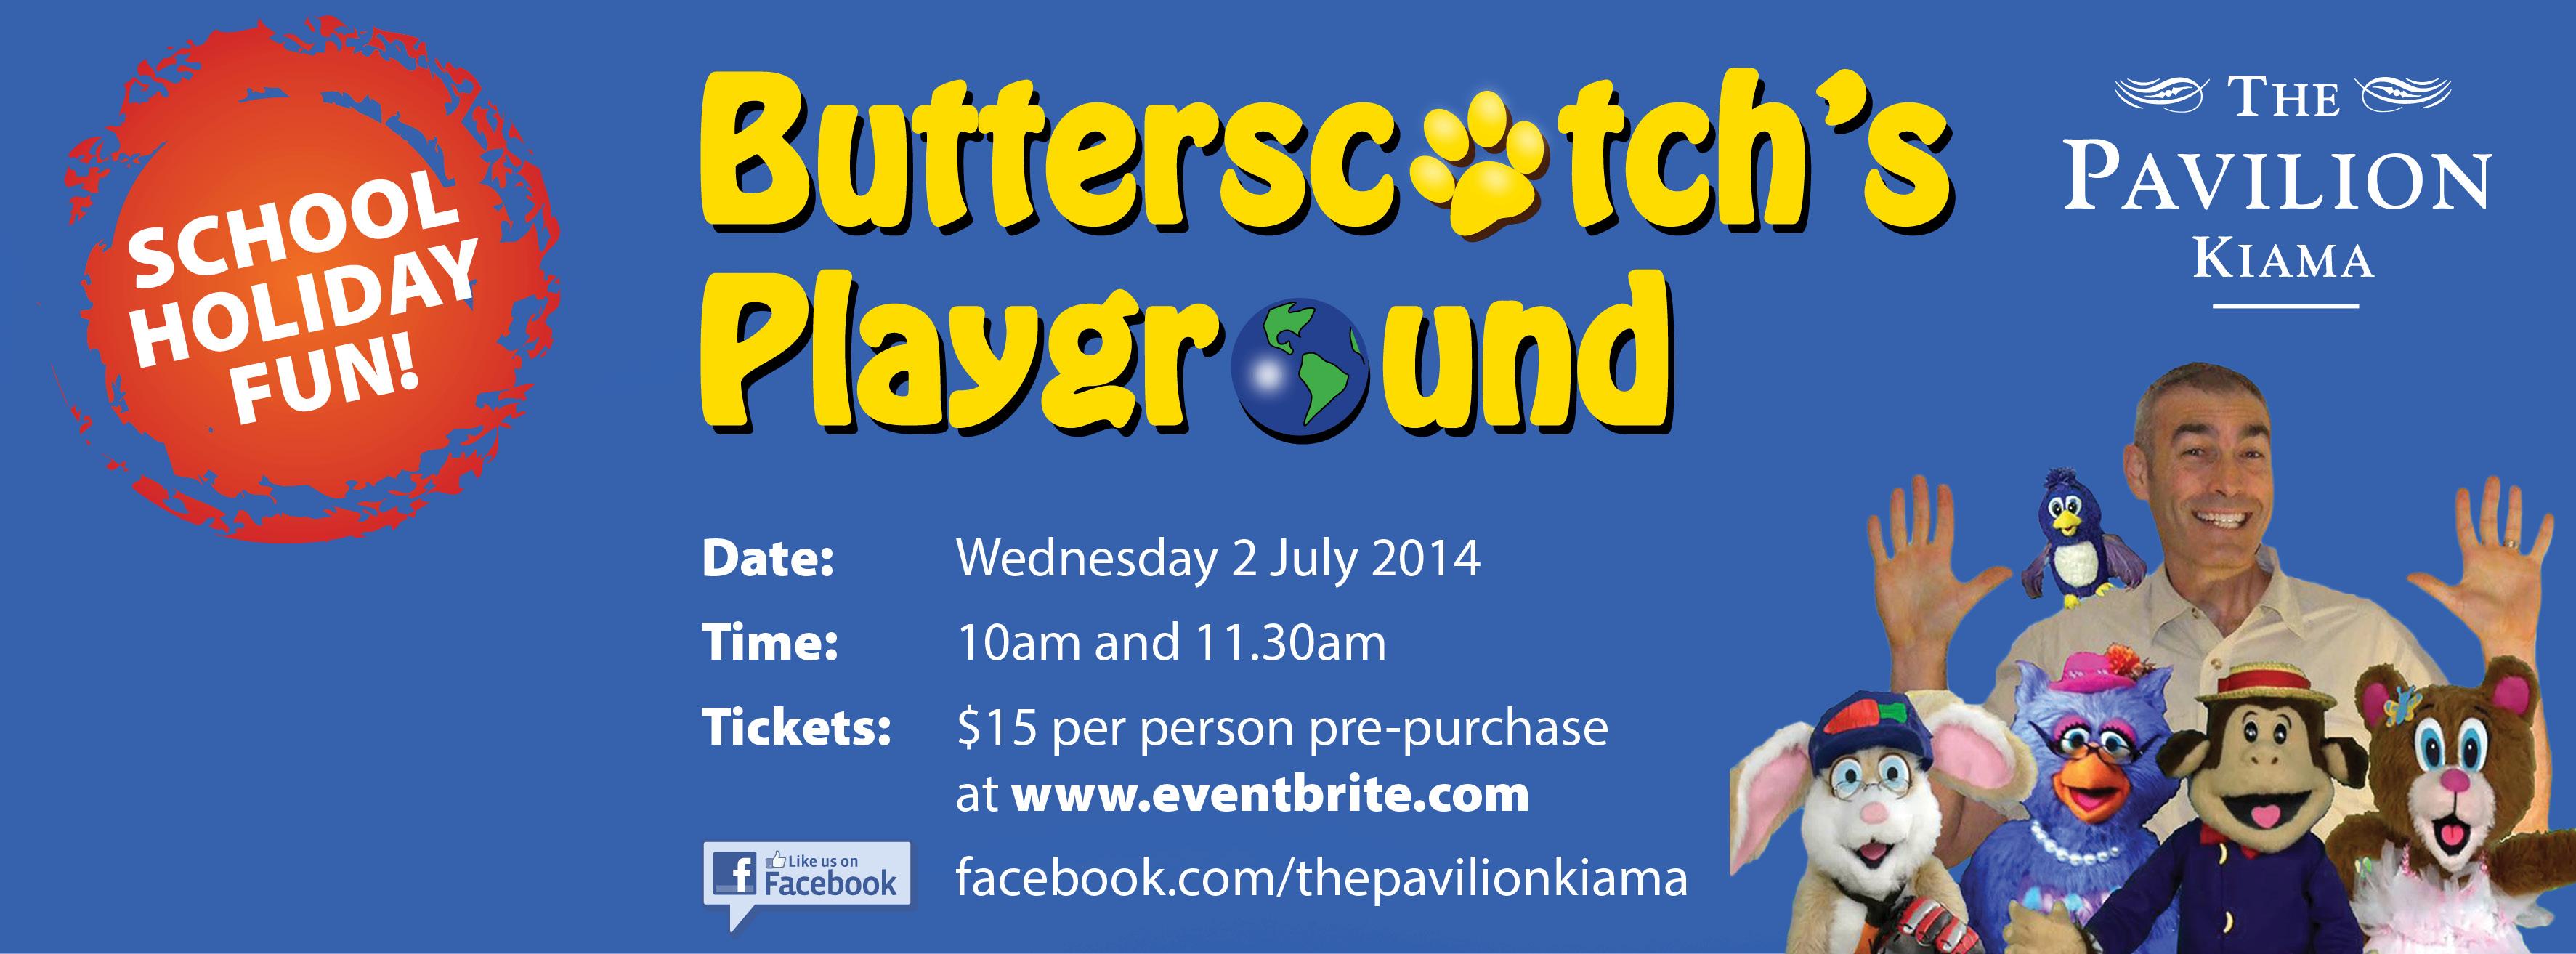 Butterscotch's Playground Event